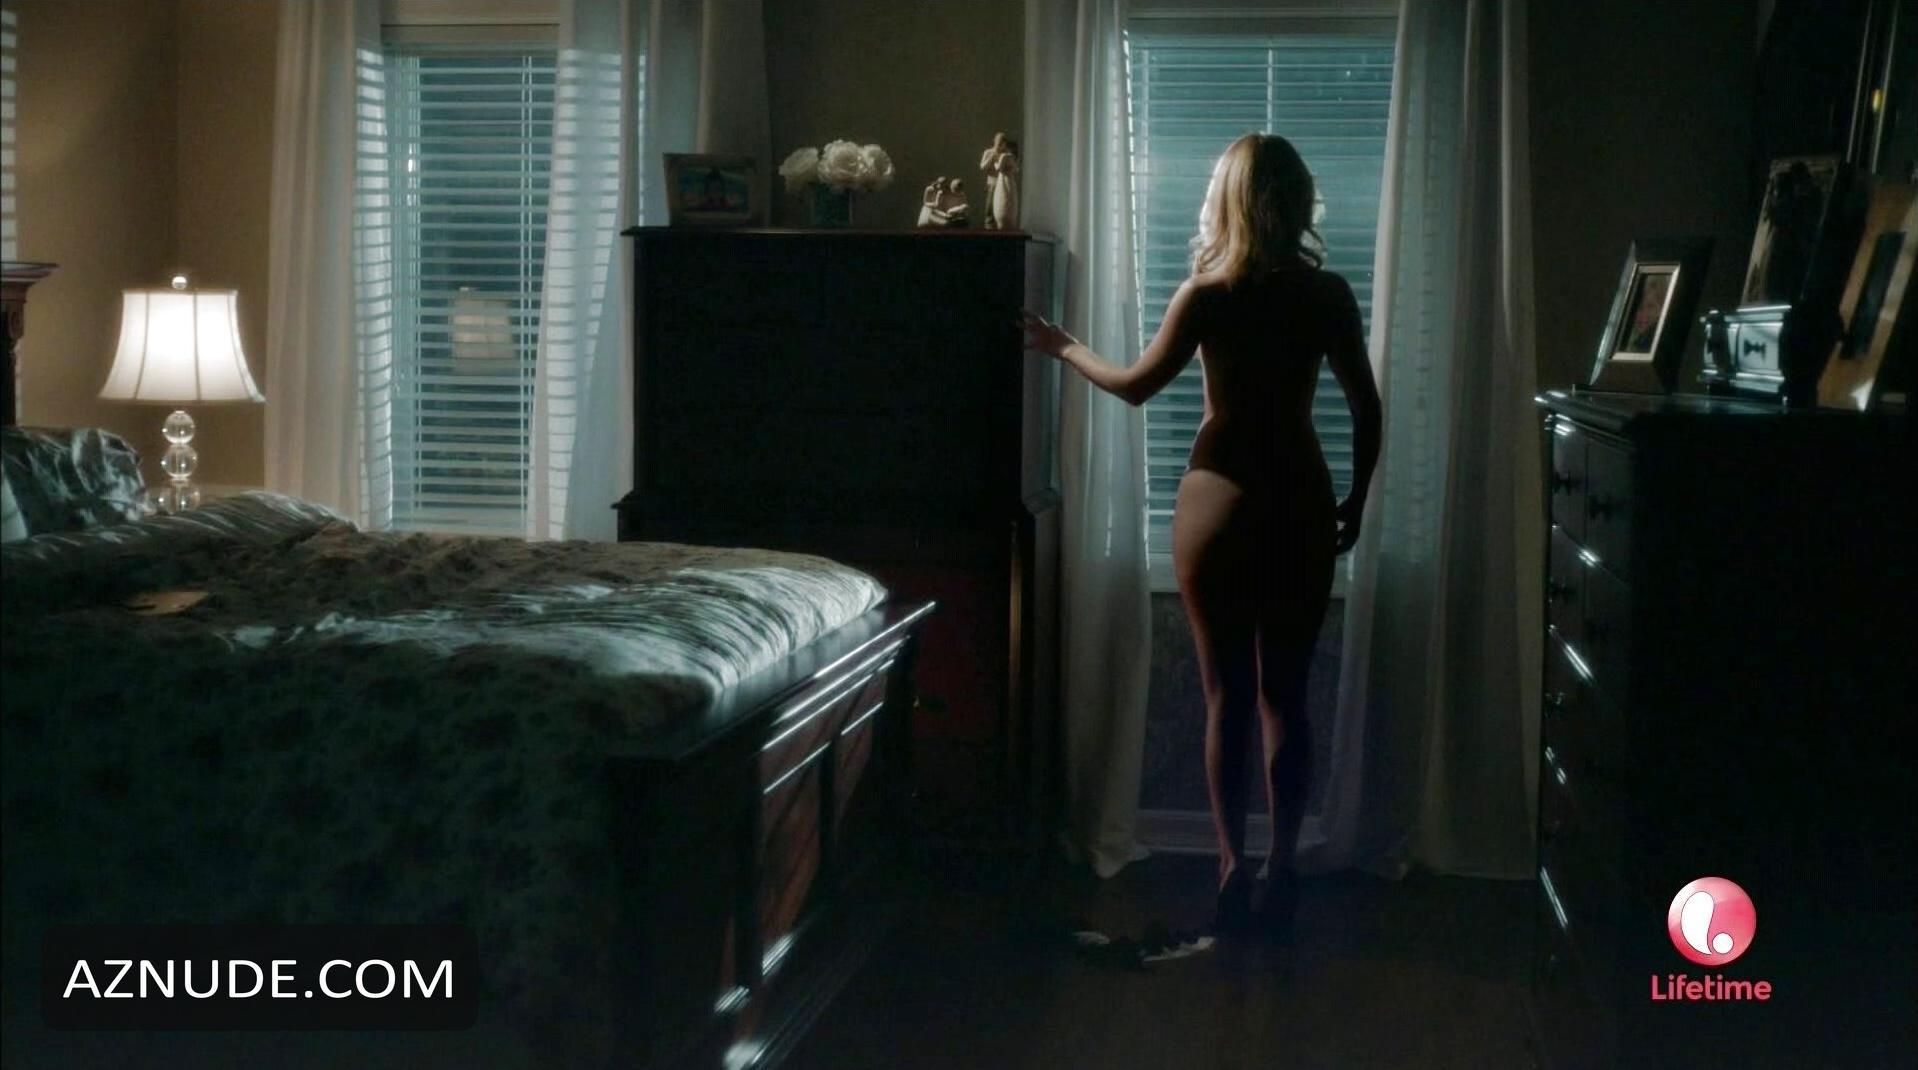 image The sex life of leonardo da vinci